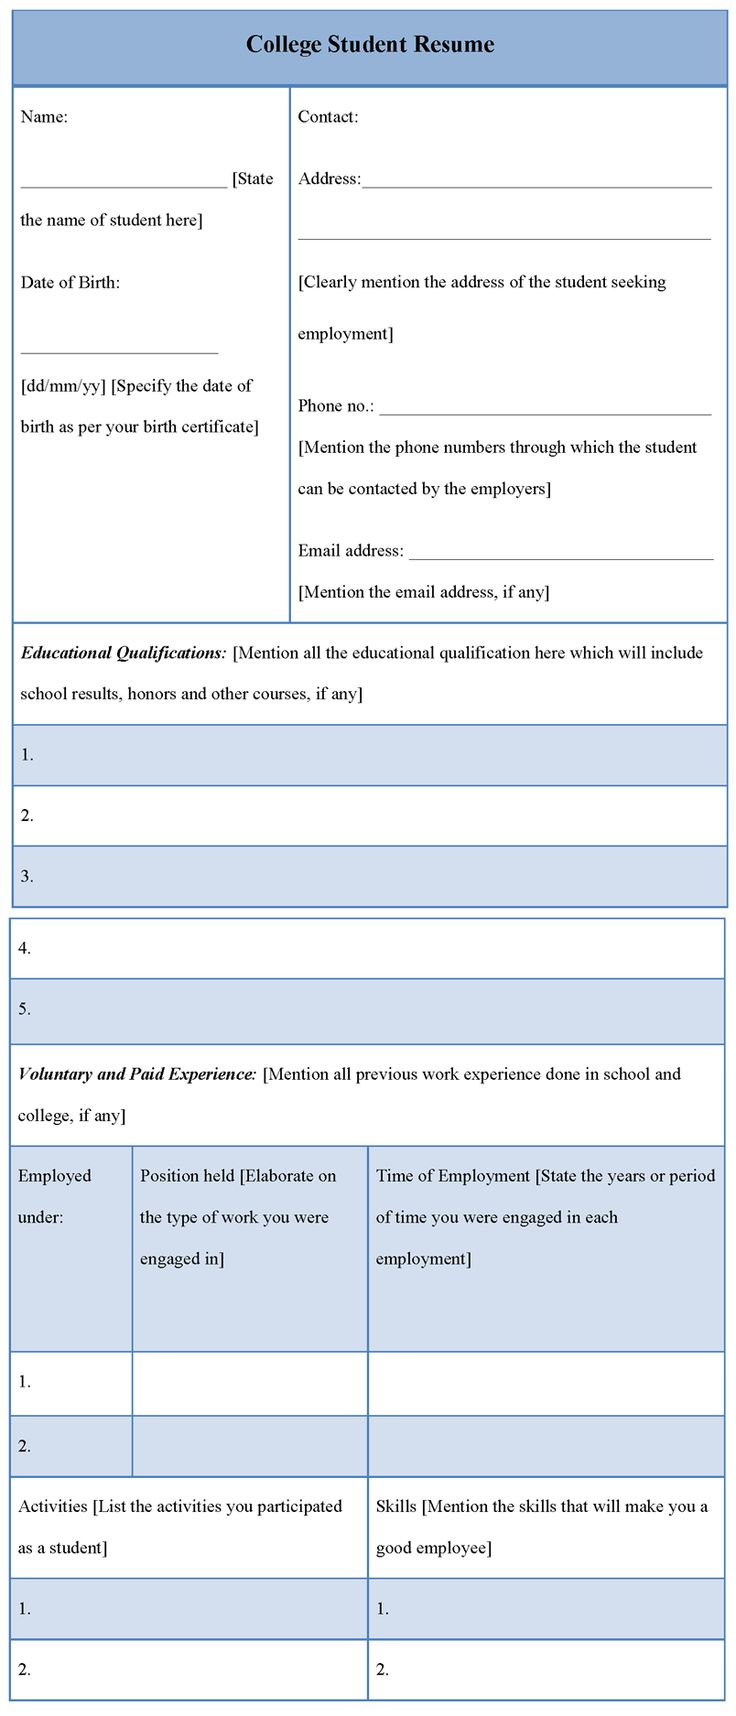 College student resume examples resume builder resume